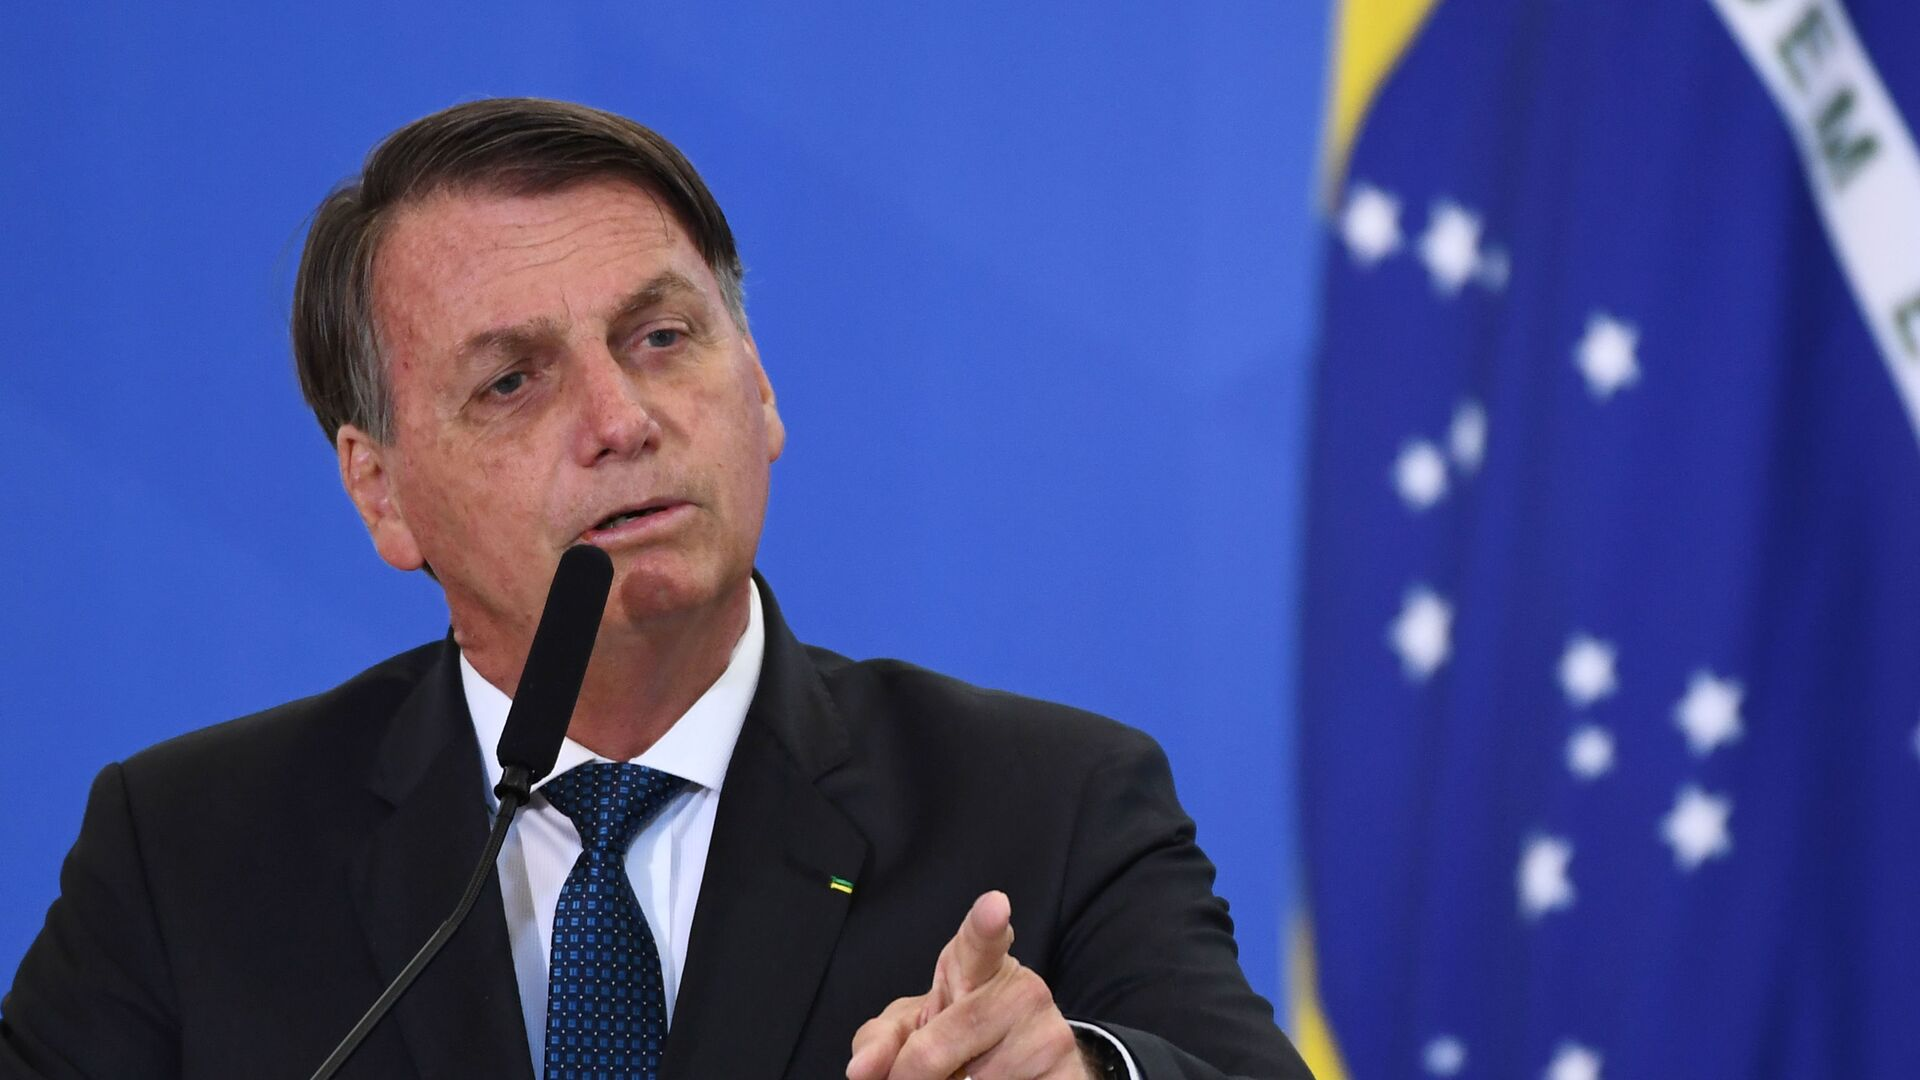 Jair Bolsonaro, presidente de Brasil - Sputnik Mundo, 1920, 11.02.2021